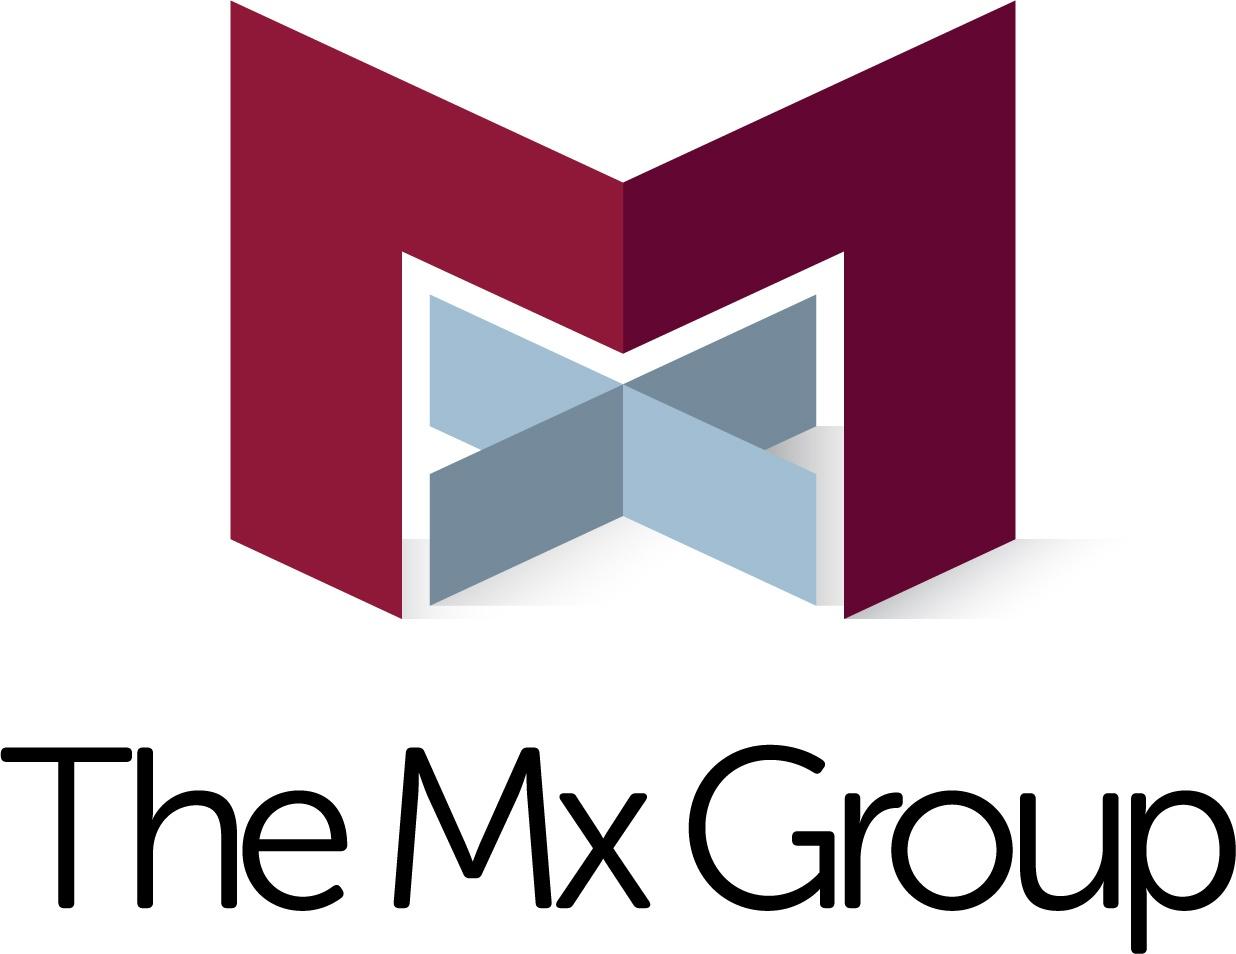 The-Mx-Group_3c_rgb.jpg